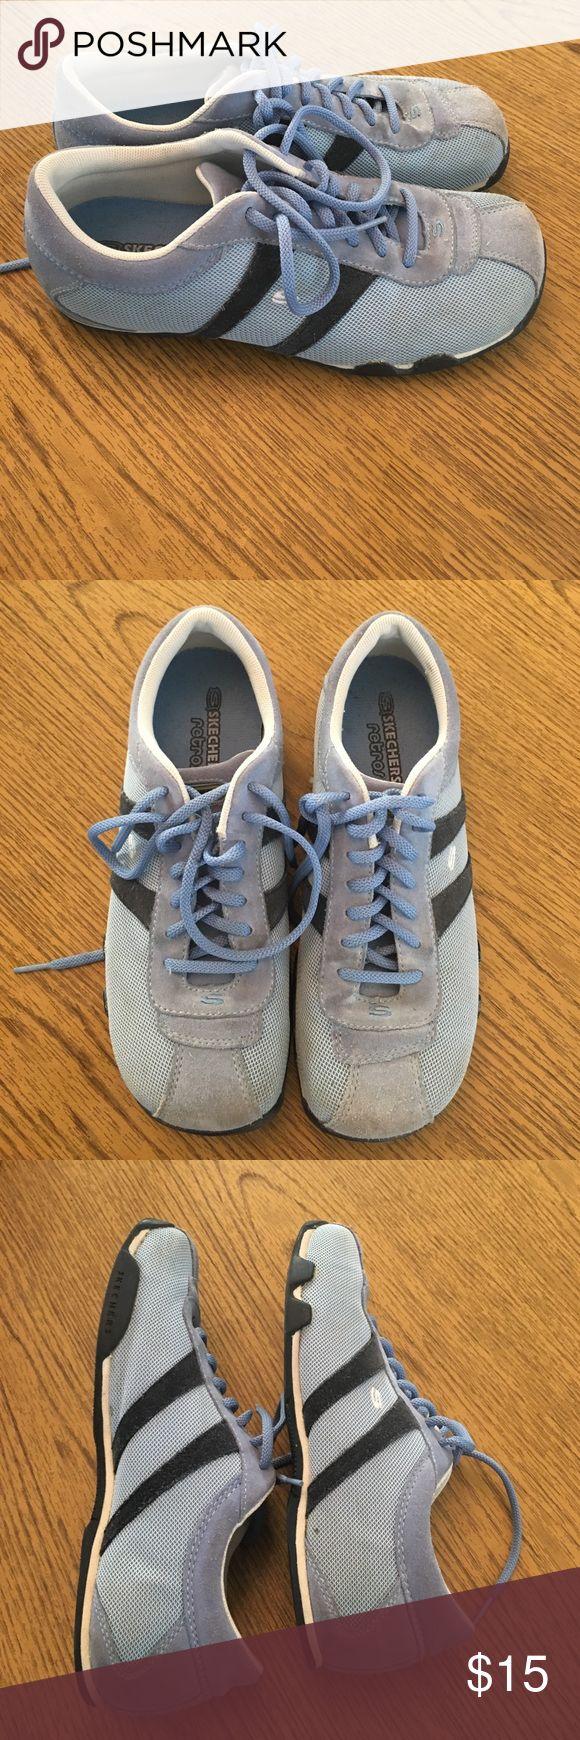 Skechers Sneakers Skechers Sneakers in good condition Skechers Shoes Sneakers